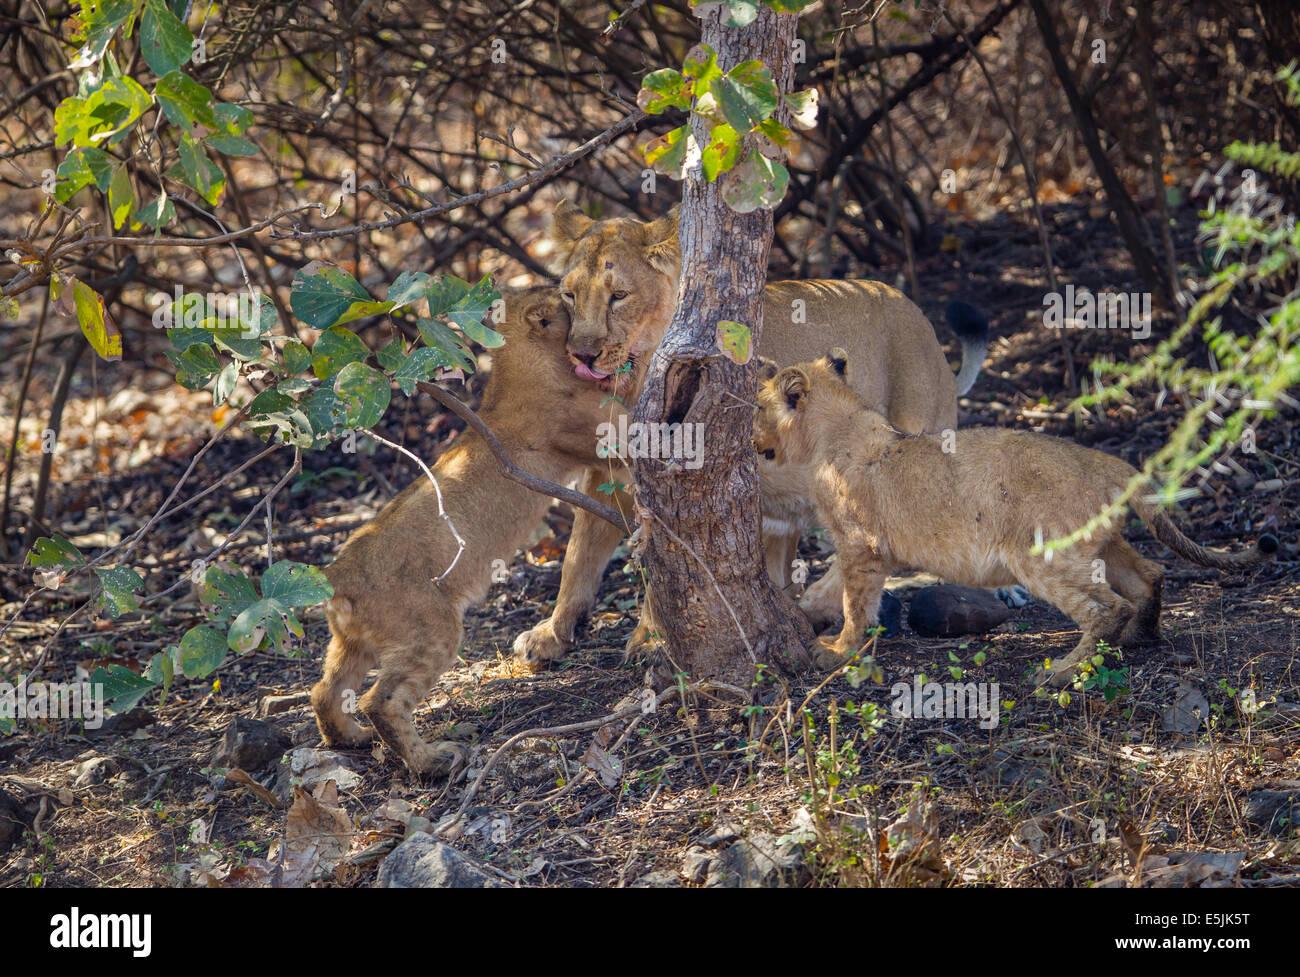 Indian Lion family [Panthera leo persica] at Gir Forest, Gujarat India. - Stock Image